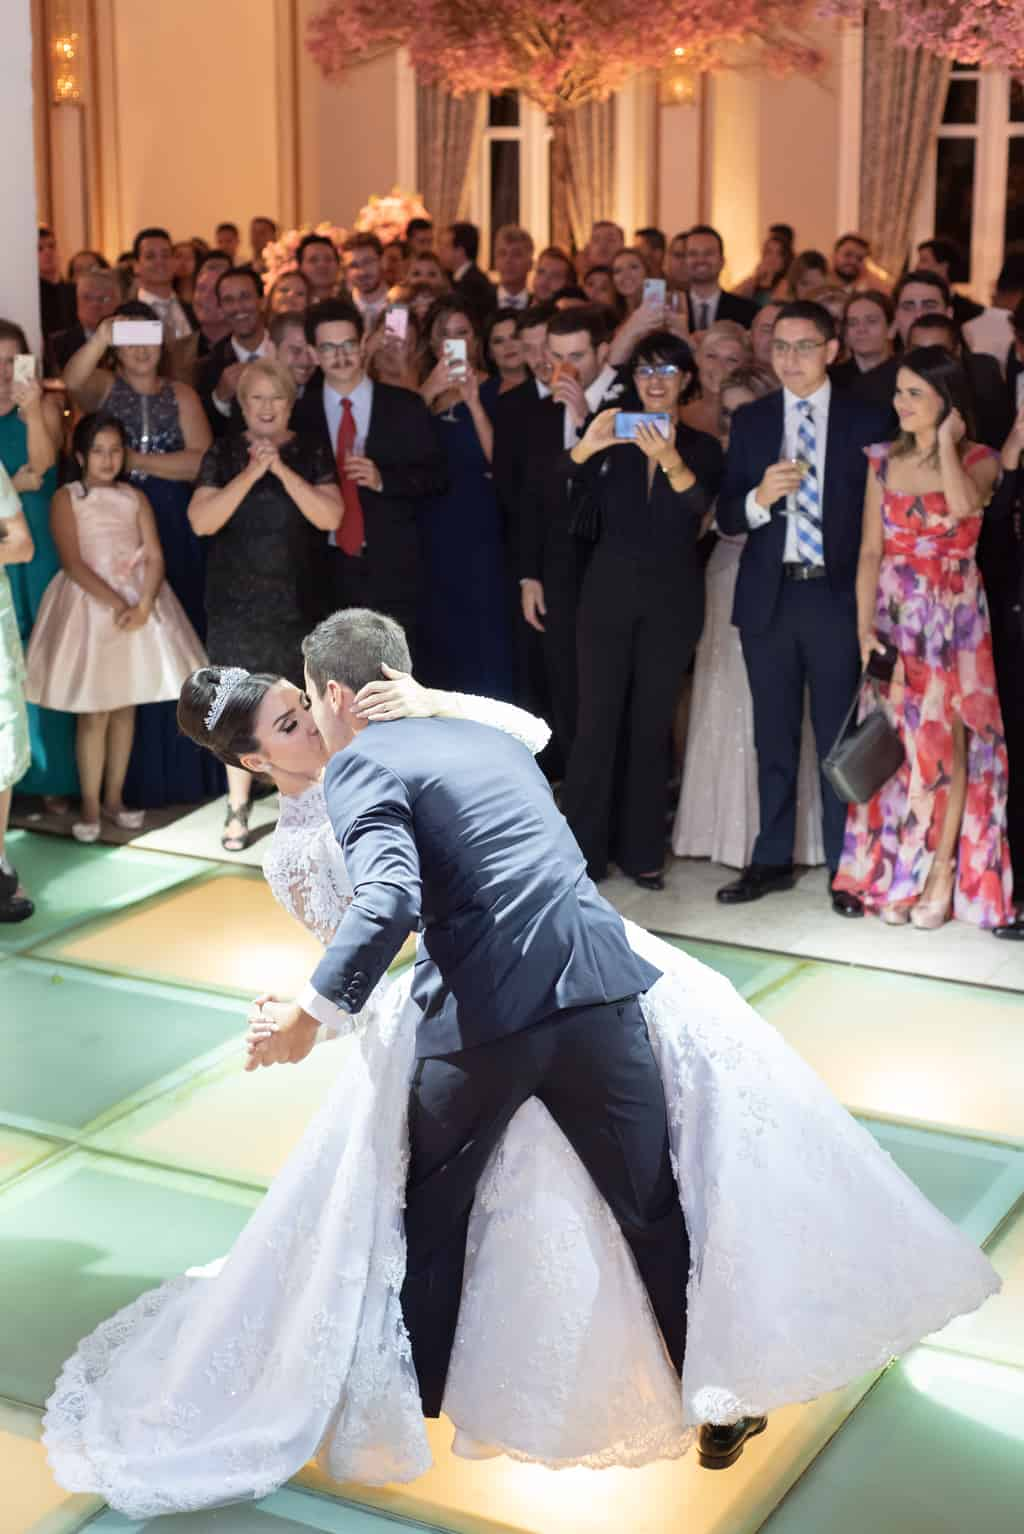 casamento-Patricia-e-Thiago-Copacabana-Palace-Daniel-Curz-A-Roseira-Paula-Rocha-Marina-Fava-festa1527-Patricia-e-Thiago-MFF_1110